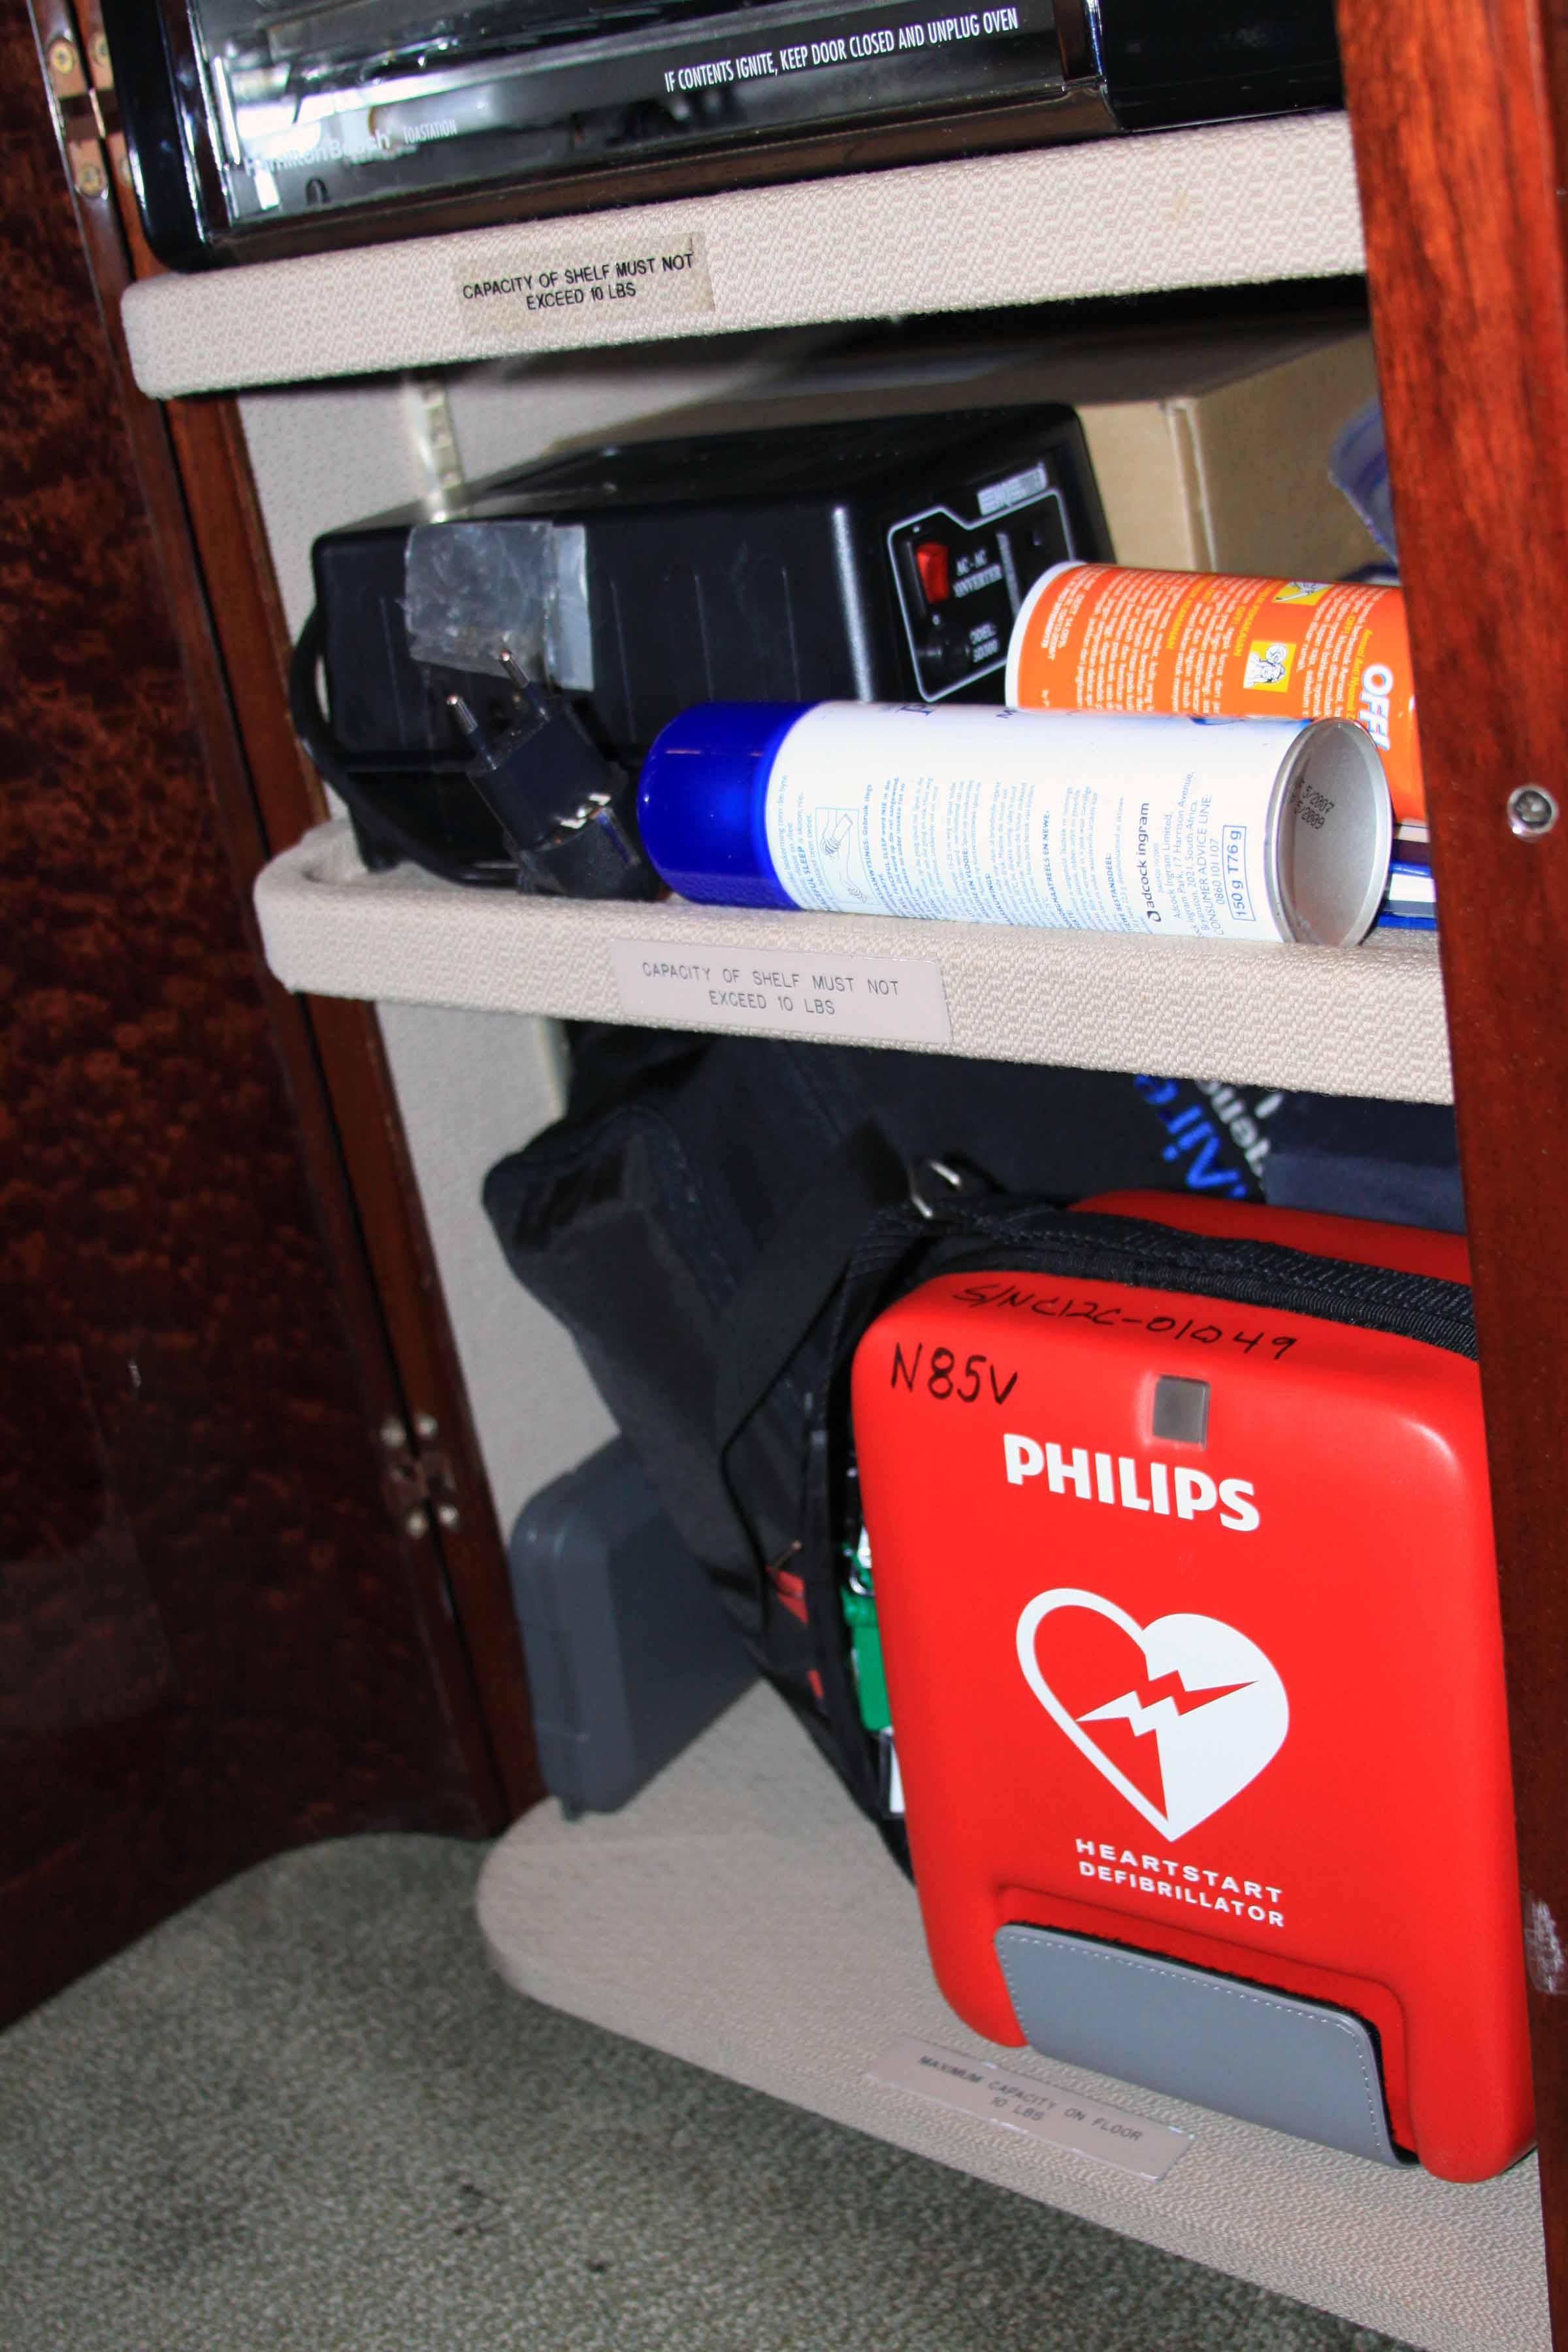 philips-fr3-on-g5-cabinet.jpg